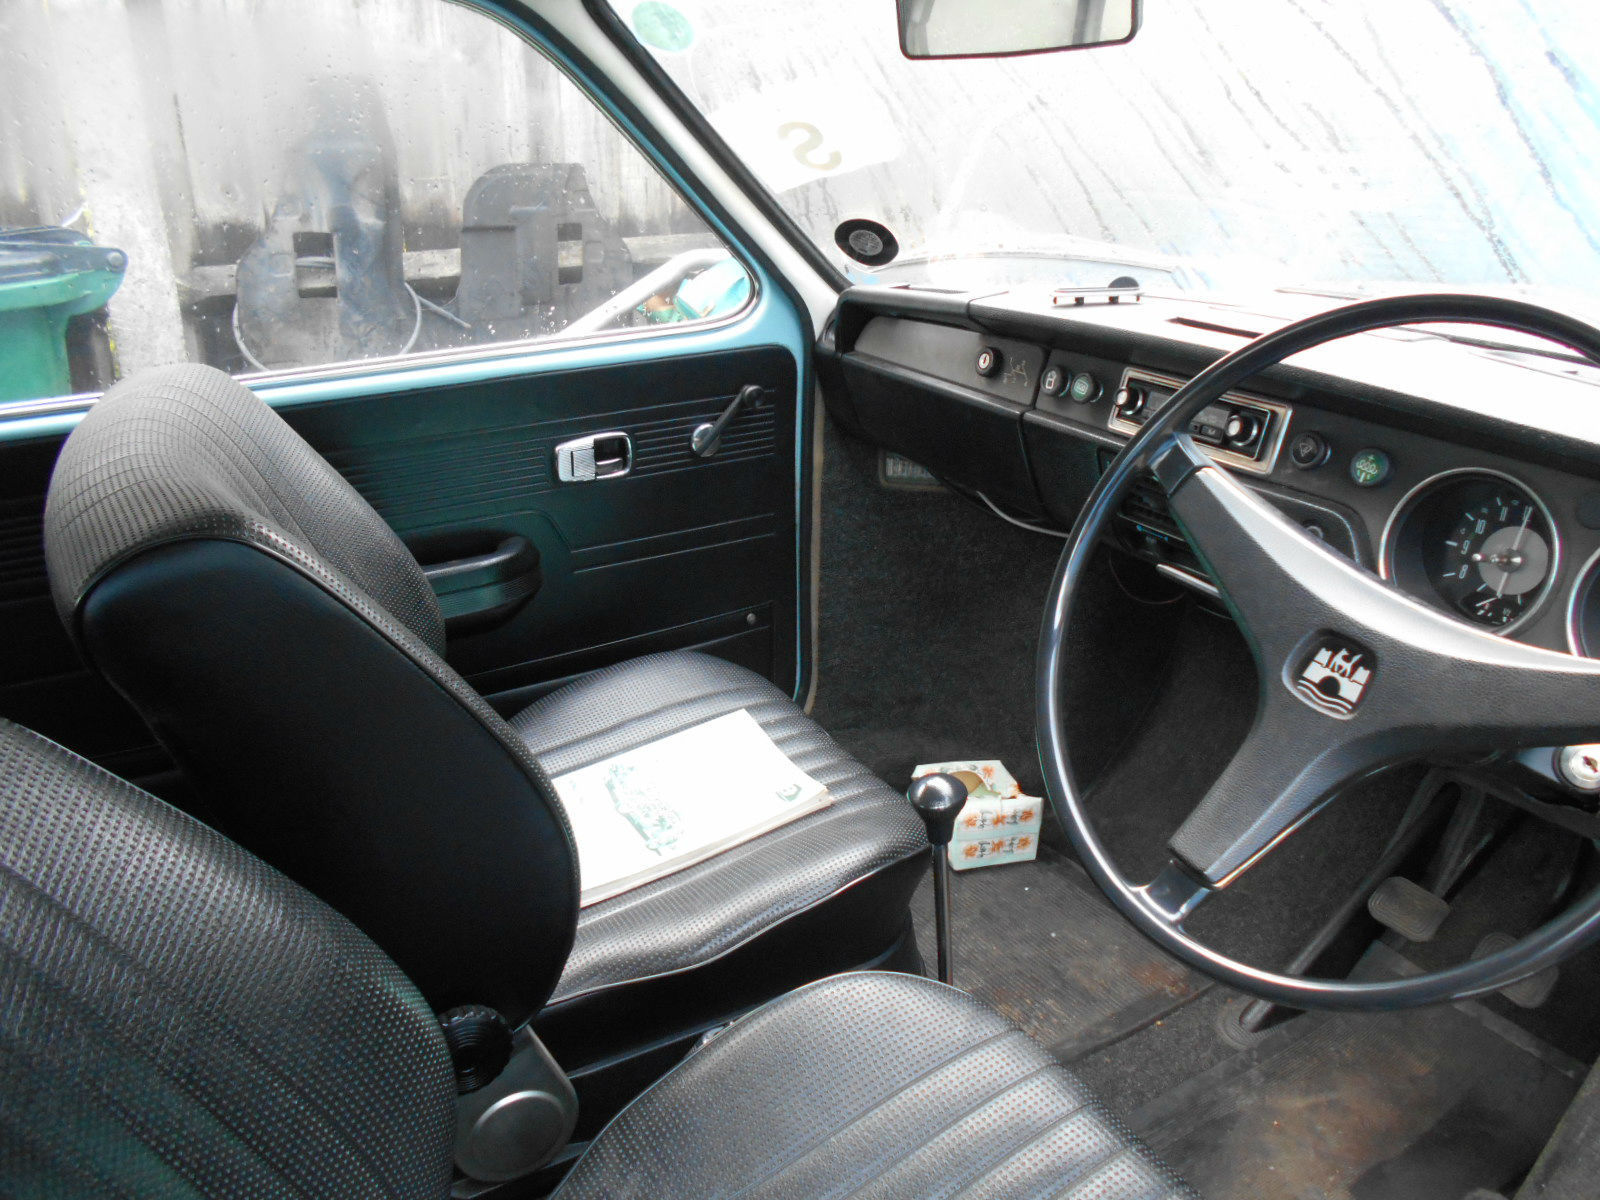 VW Variant Front Interior.JPG